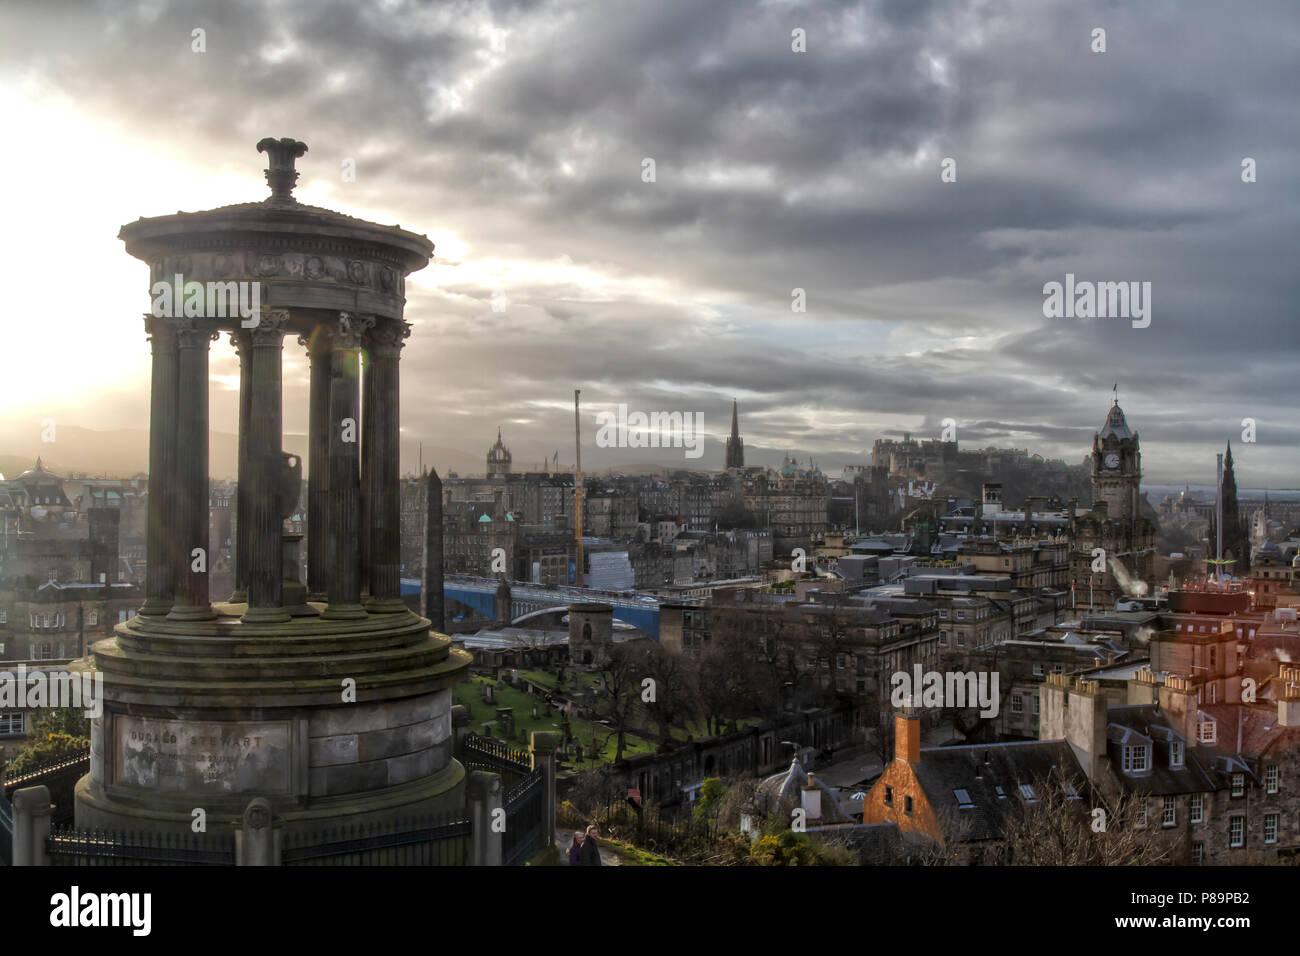 Cloudy skies on New Year's Eve 2017 (31 January 2017) atop Calton Hill with the Edinburgh skyline, Scotland, United Kingdom. HDR Image. Stock Photo